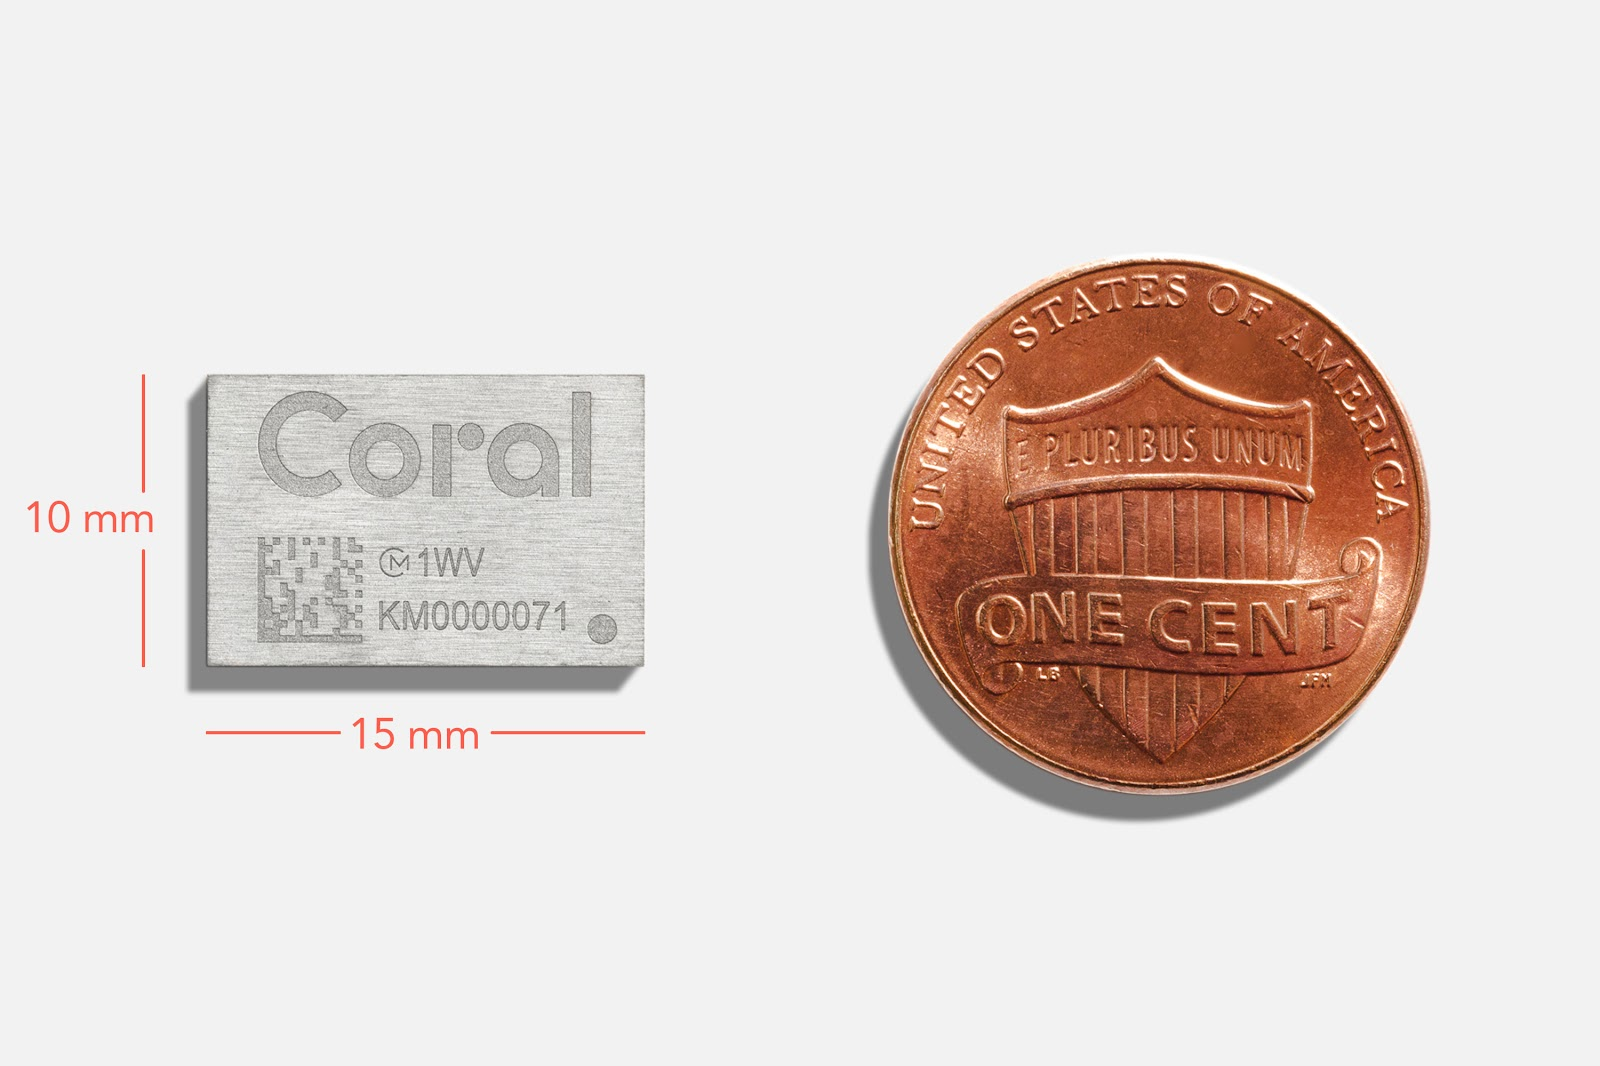 Coral Accelerator Module, a new multi-chip module with Google Edge TPU